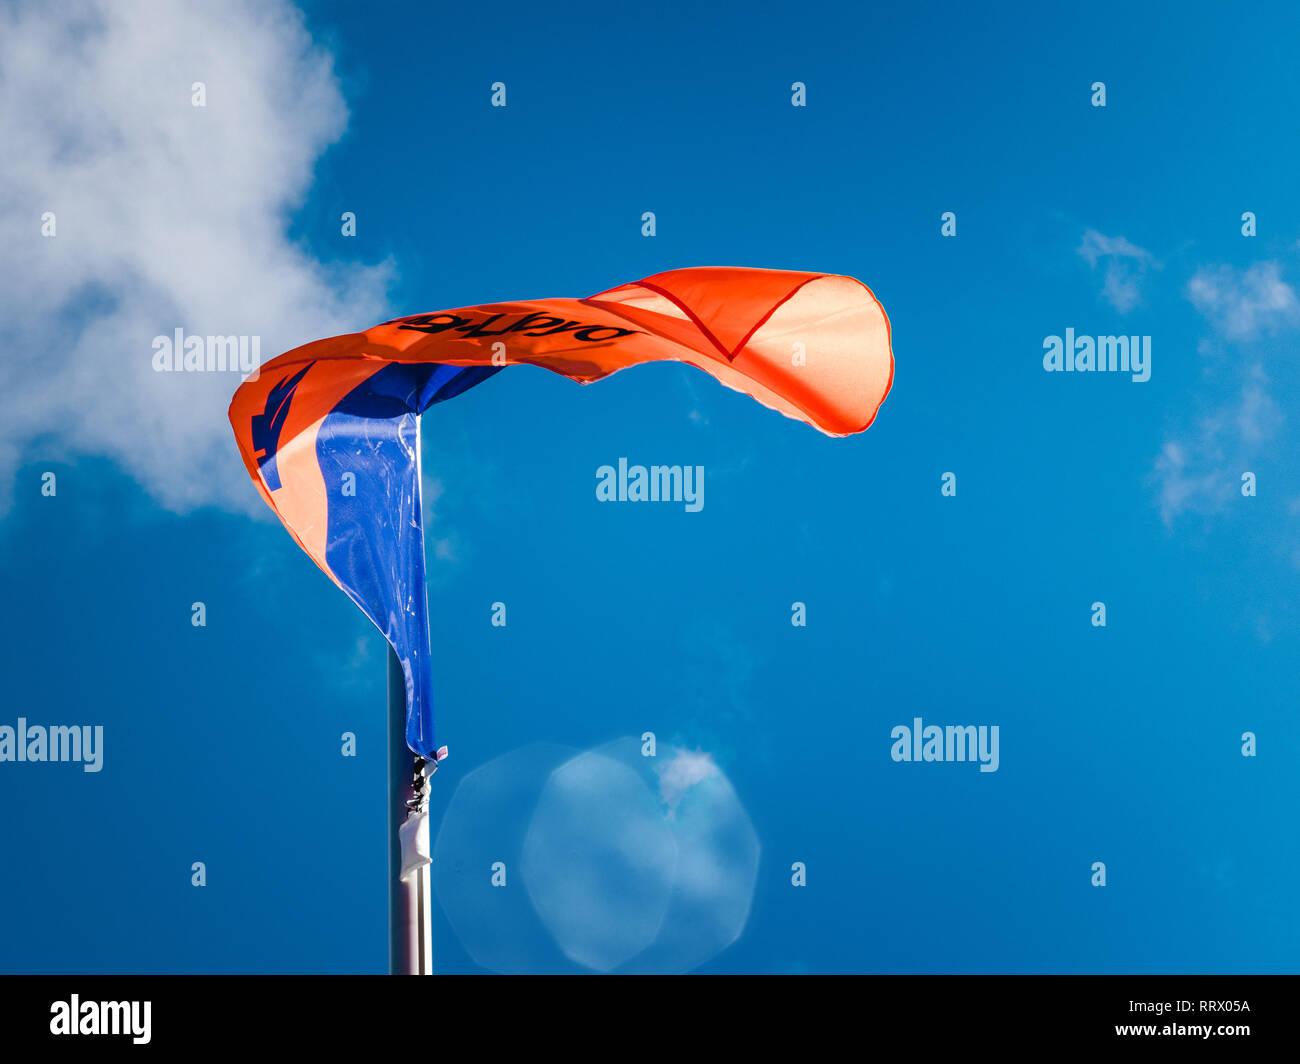 HAMBURG, GERMANY - MAR 20, 2018:  Hapag-Lloyd transnational German-based transportation company flag waving against blue sky - Stock Image